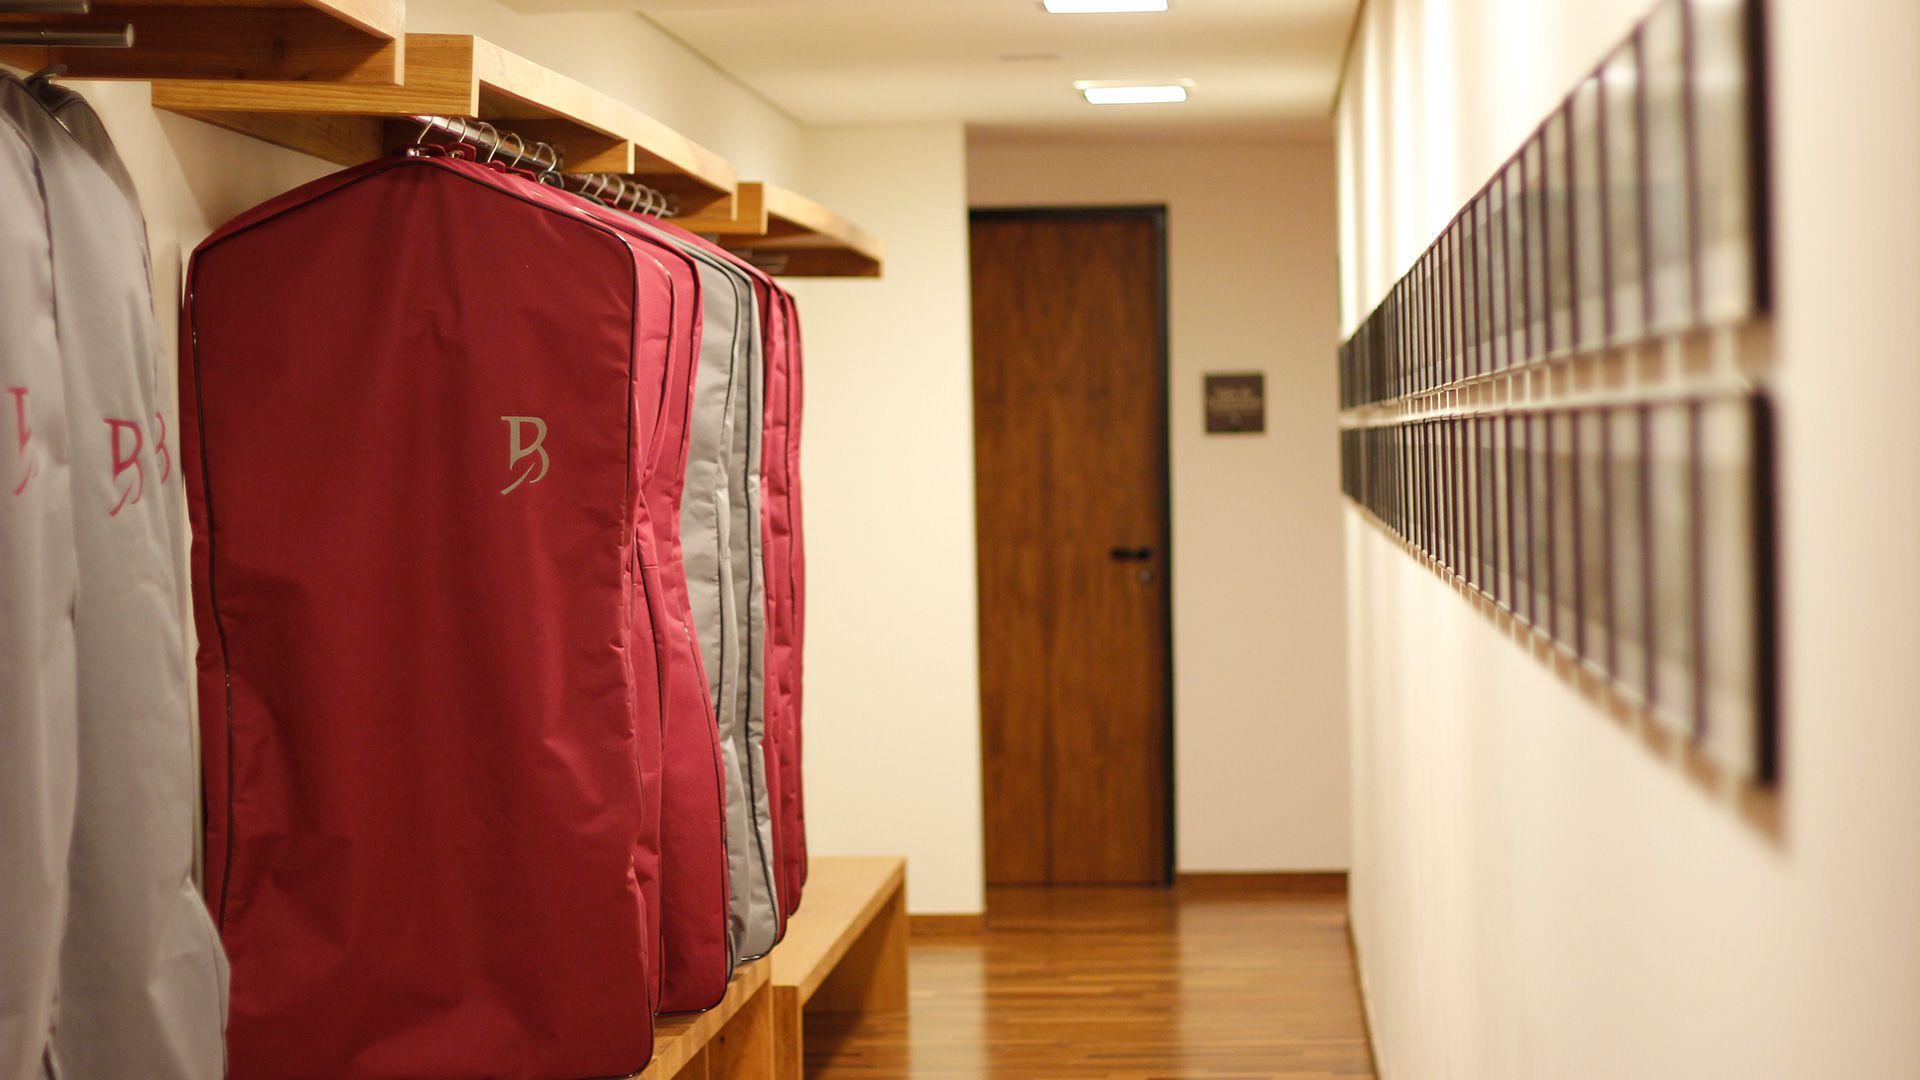 16-spa-hotel-botanique-foto-corredor-cabideiro